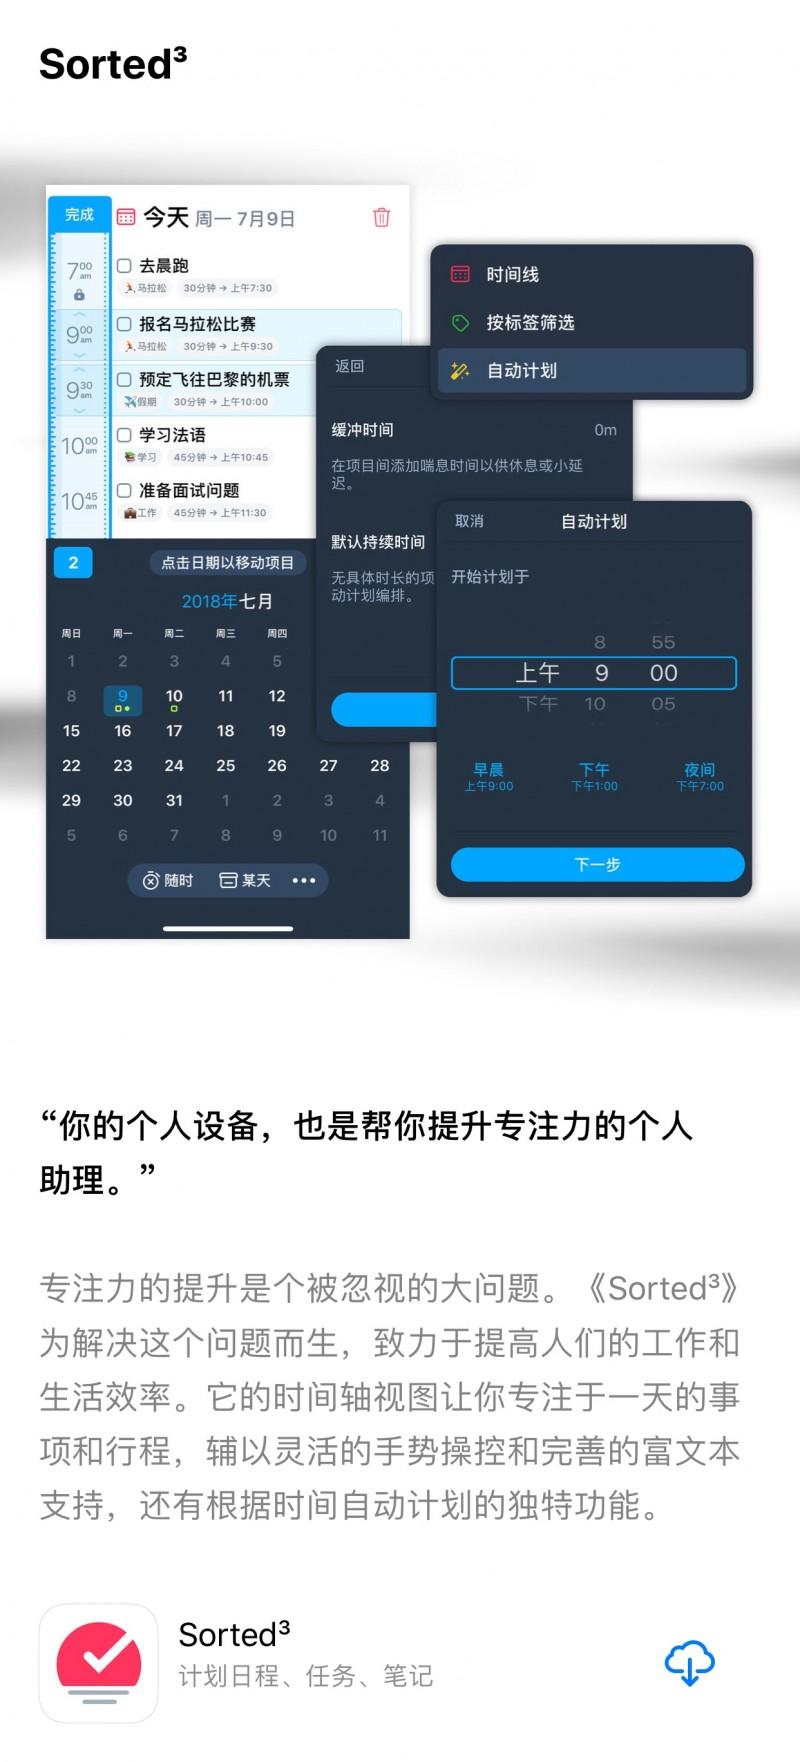 [内购]Sorted³-草蜢资源